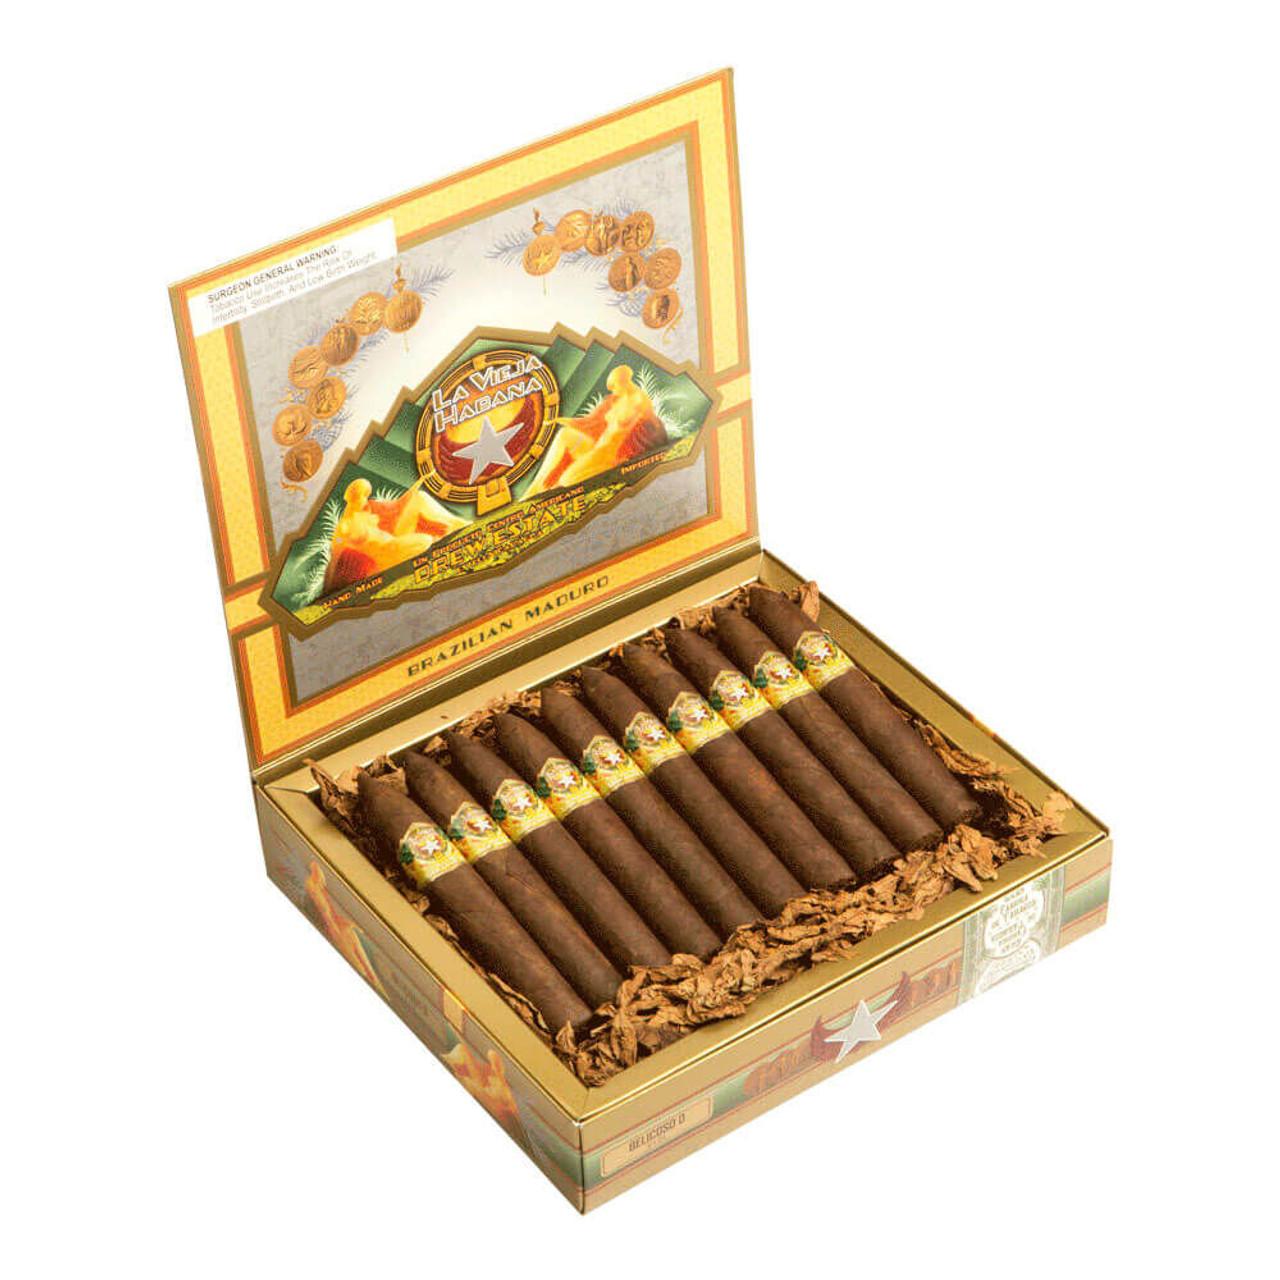 La Vieja Habana Belicoso D Maduro Cigars - 6 x 54 (Box of 20)